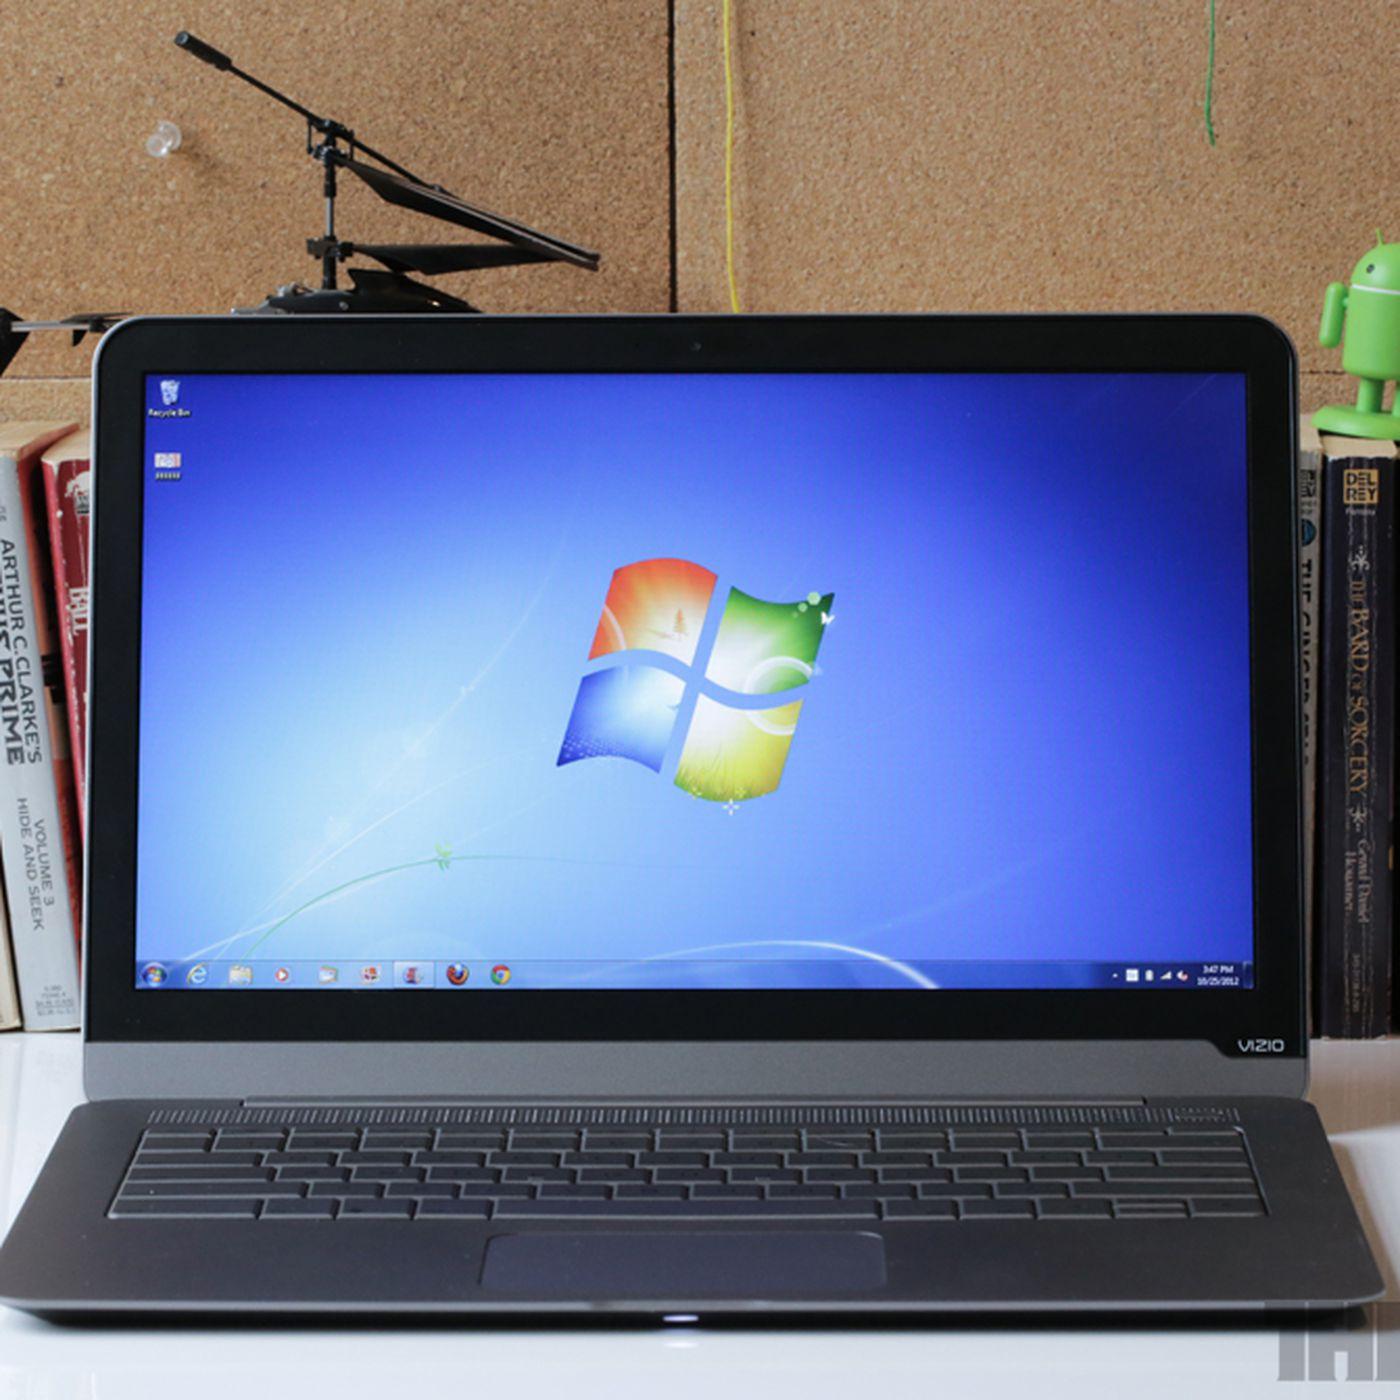 New Bug Allows Websites To Crash Windows 7 Or 8 Pcs